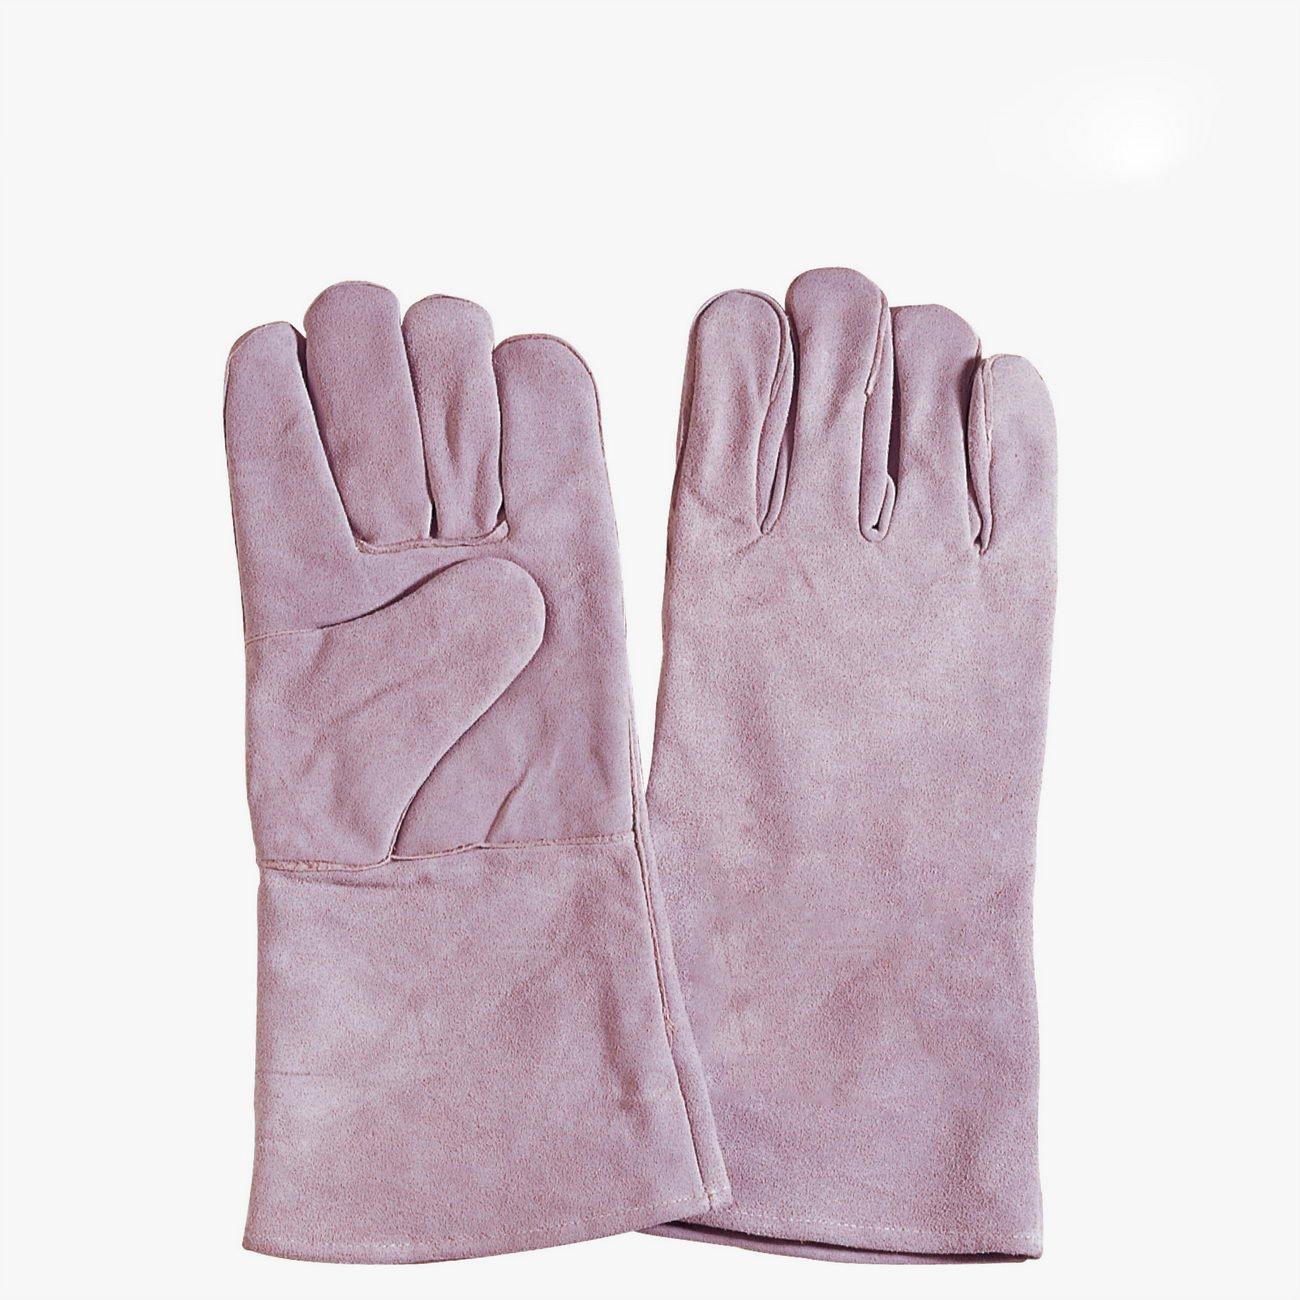 jii2030shann leather welding gloves/jia barbecue glove gloves full lining welding gloves, leather welding gloves, gloves, welding gloves, leather gloves, welder gloves